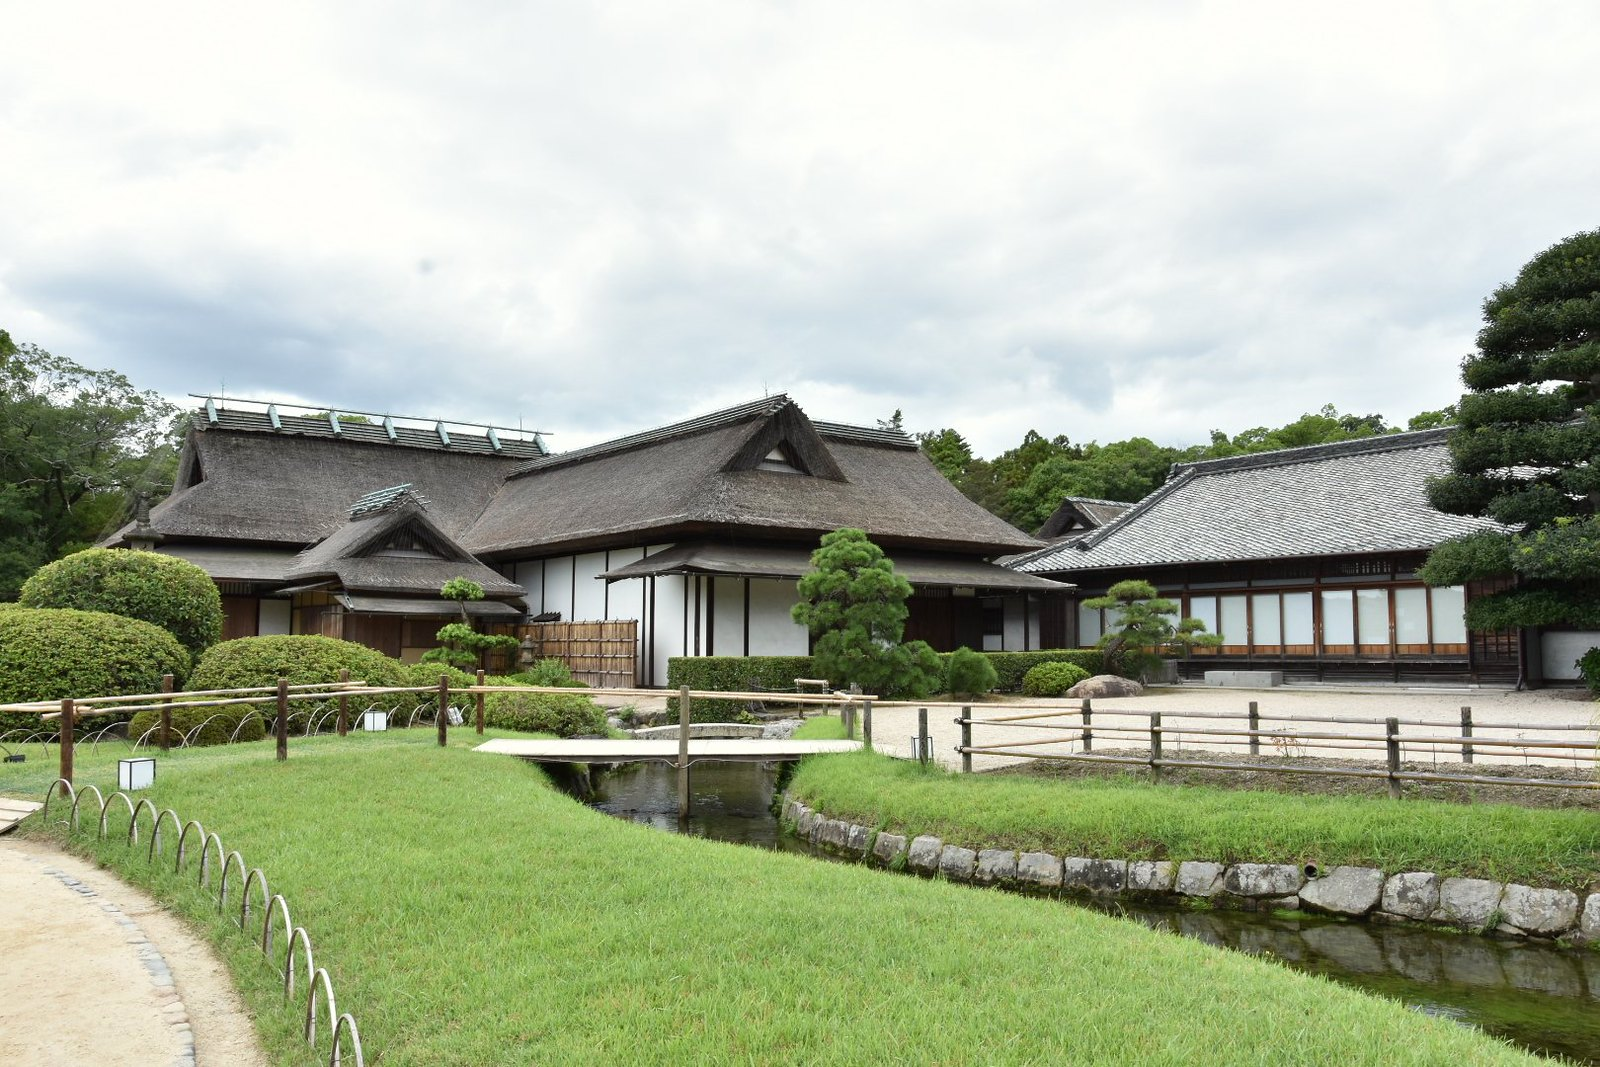 Jardins de Kôraku-en - Enyô-tei , demeure où séjournait le Daimyô